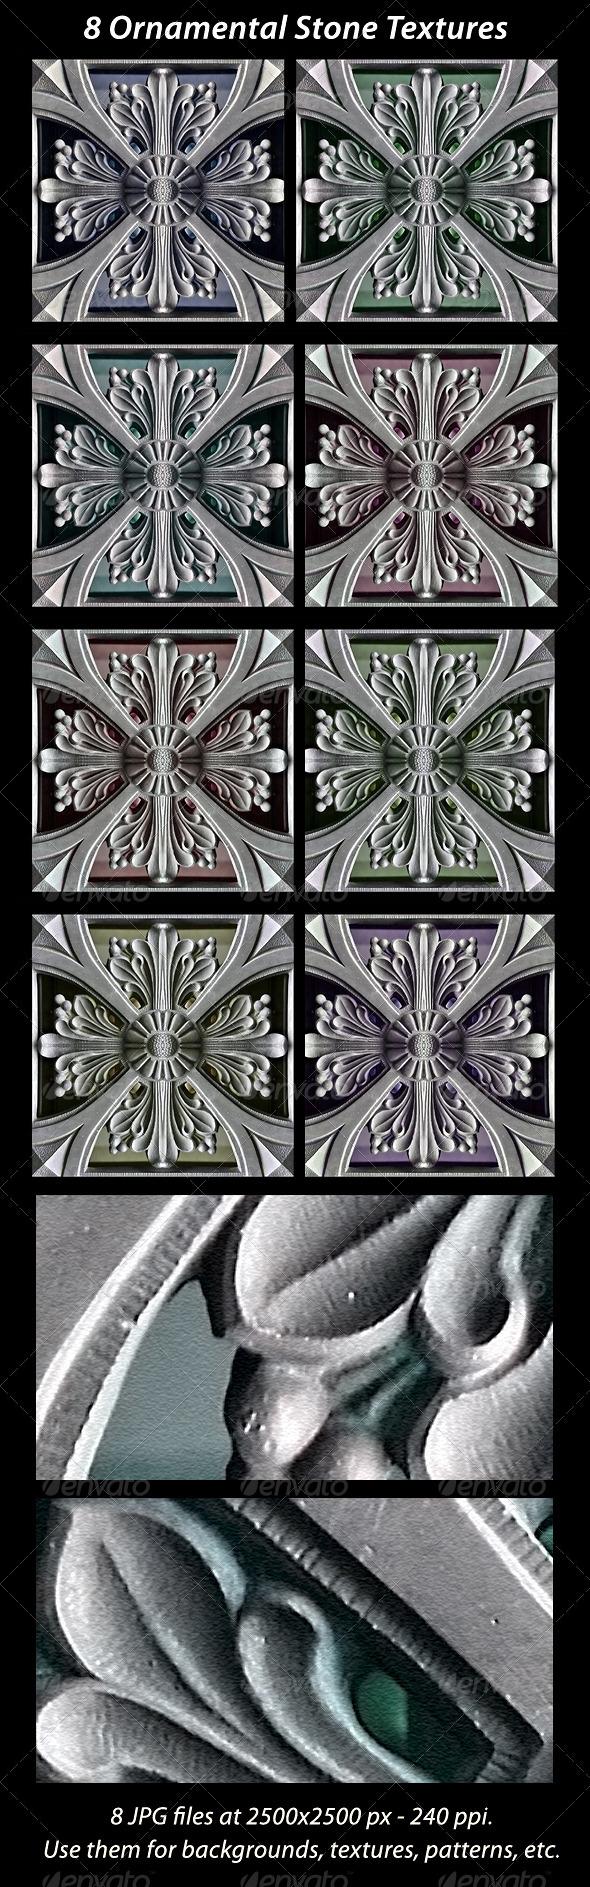 8 Ornamental Stones Textures - Stone Textures